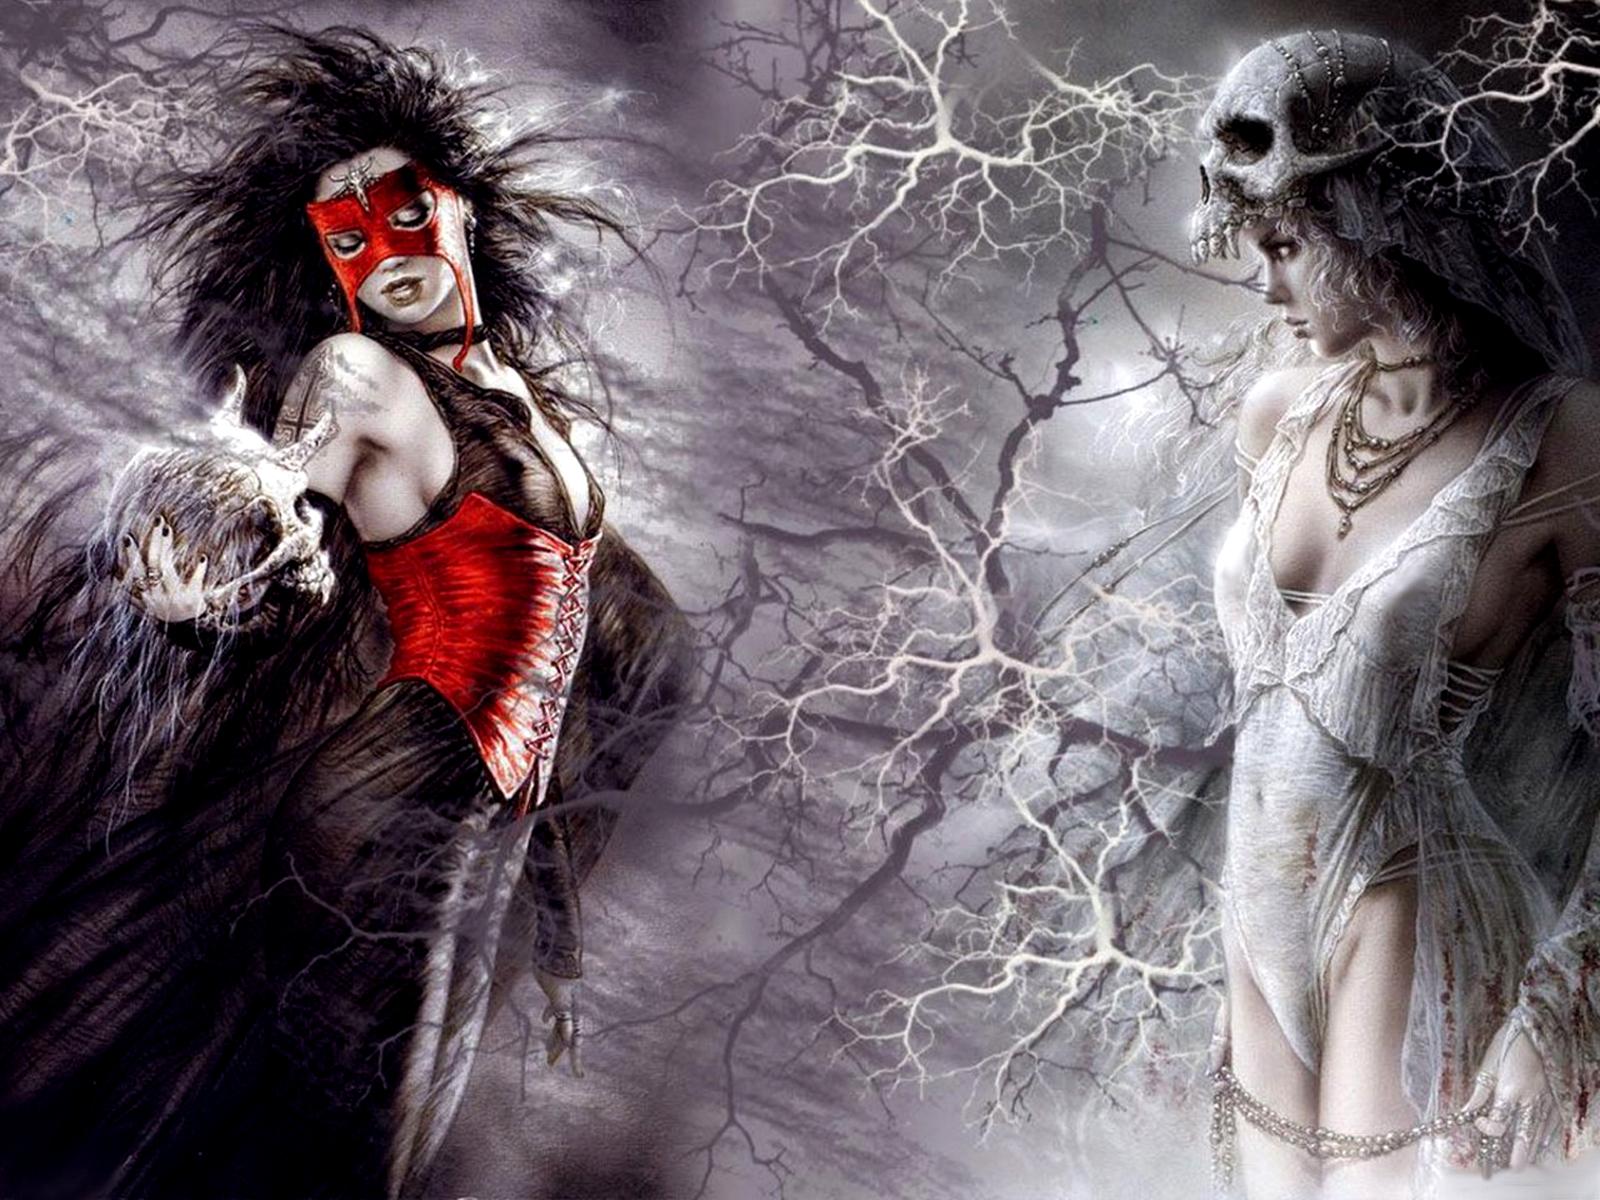 Fantasy women evil - photo#5